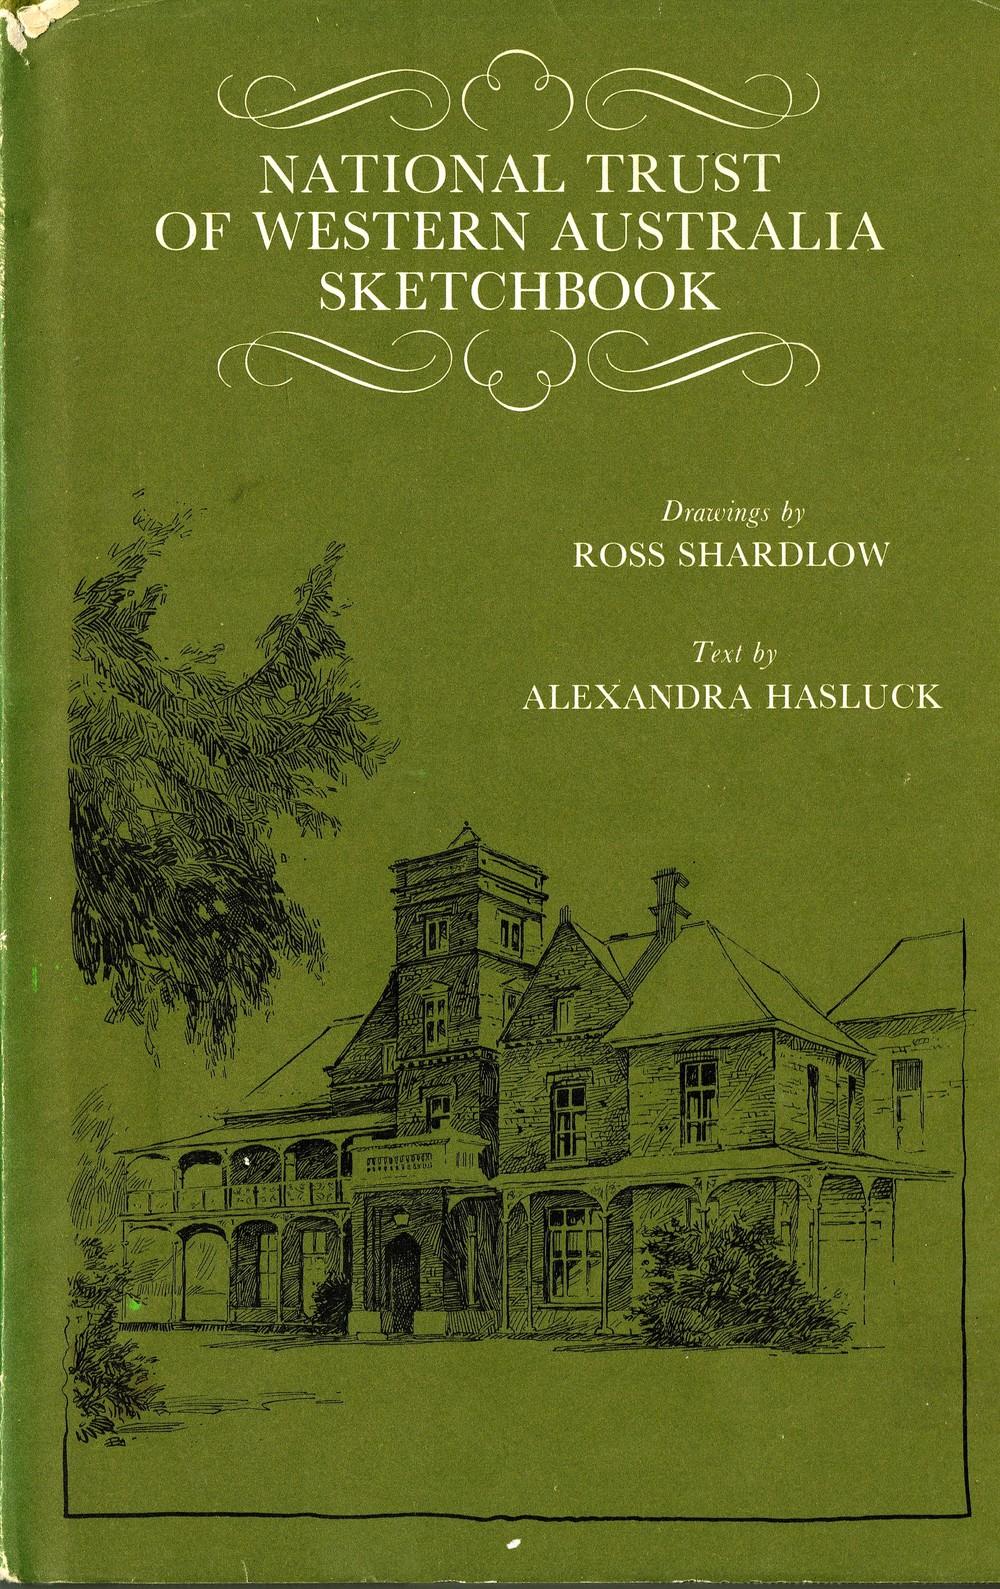 National-Trust-of-Western-Australia-Sketchbook